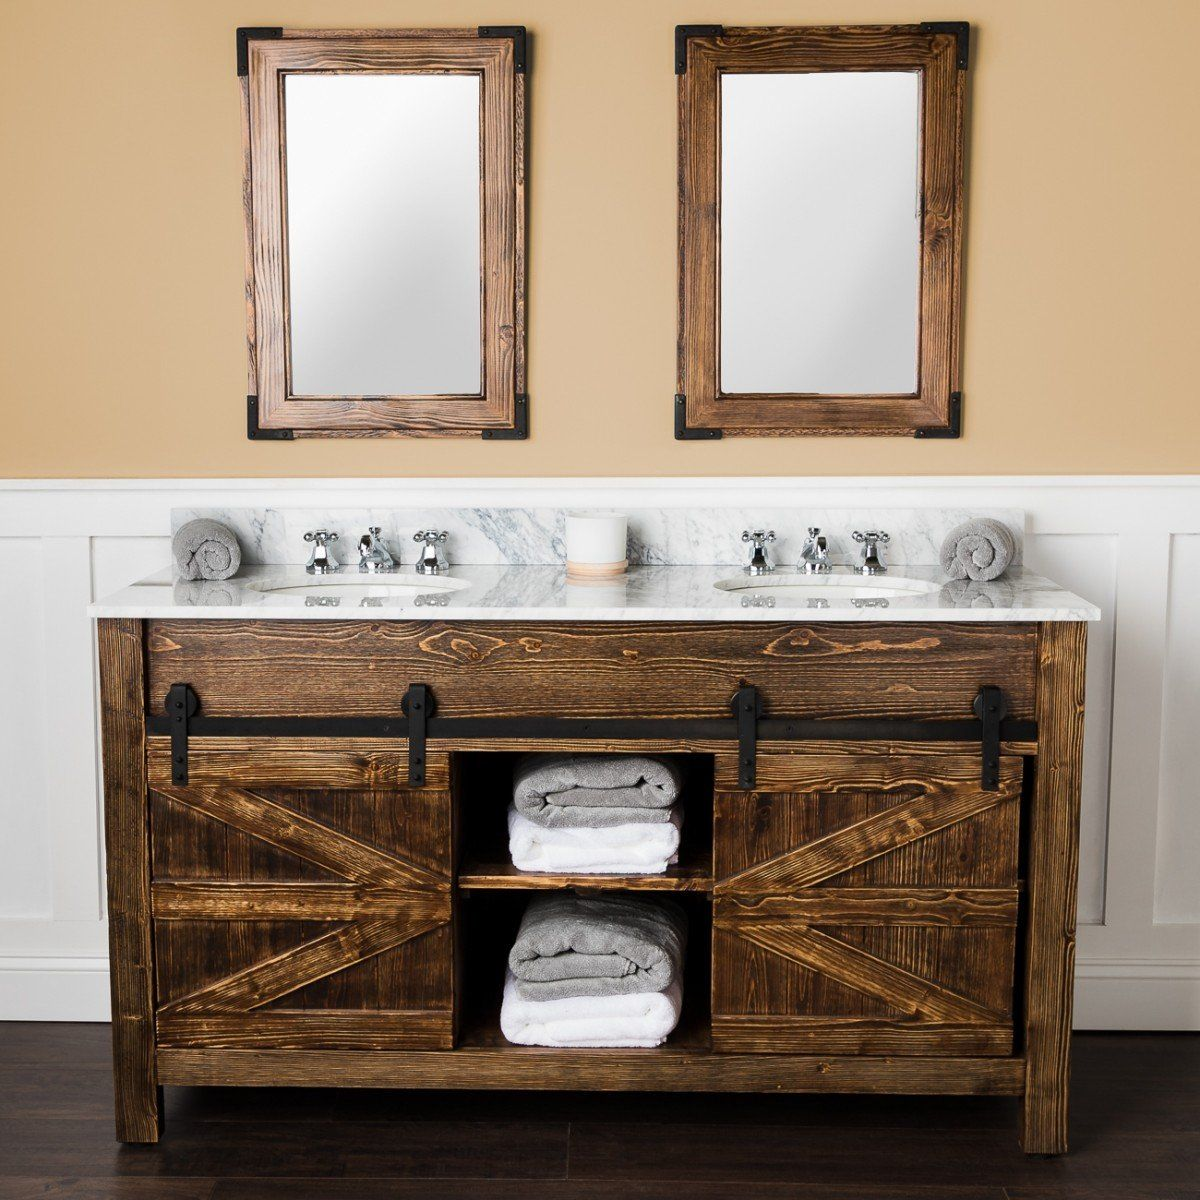 Cottage Barn Door Vanity With Mirror Farmhouse Bathroom Vanity Bathroom Vanity Interior Barn Doors